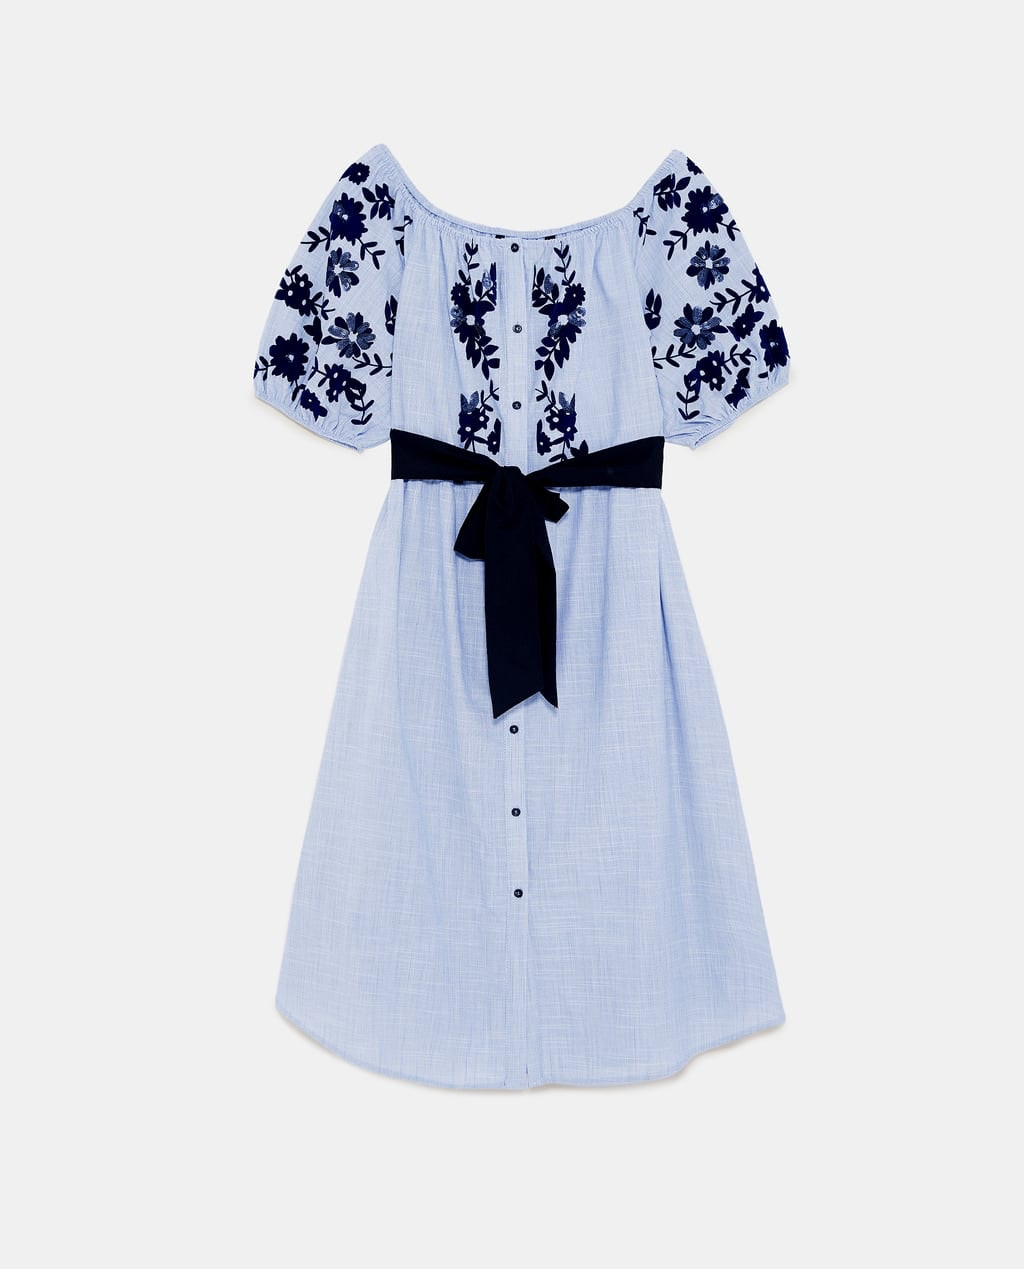 b777579846c 5 Affordable Clothing Brands Kate Middleton Loves